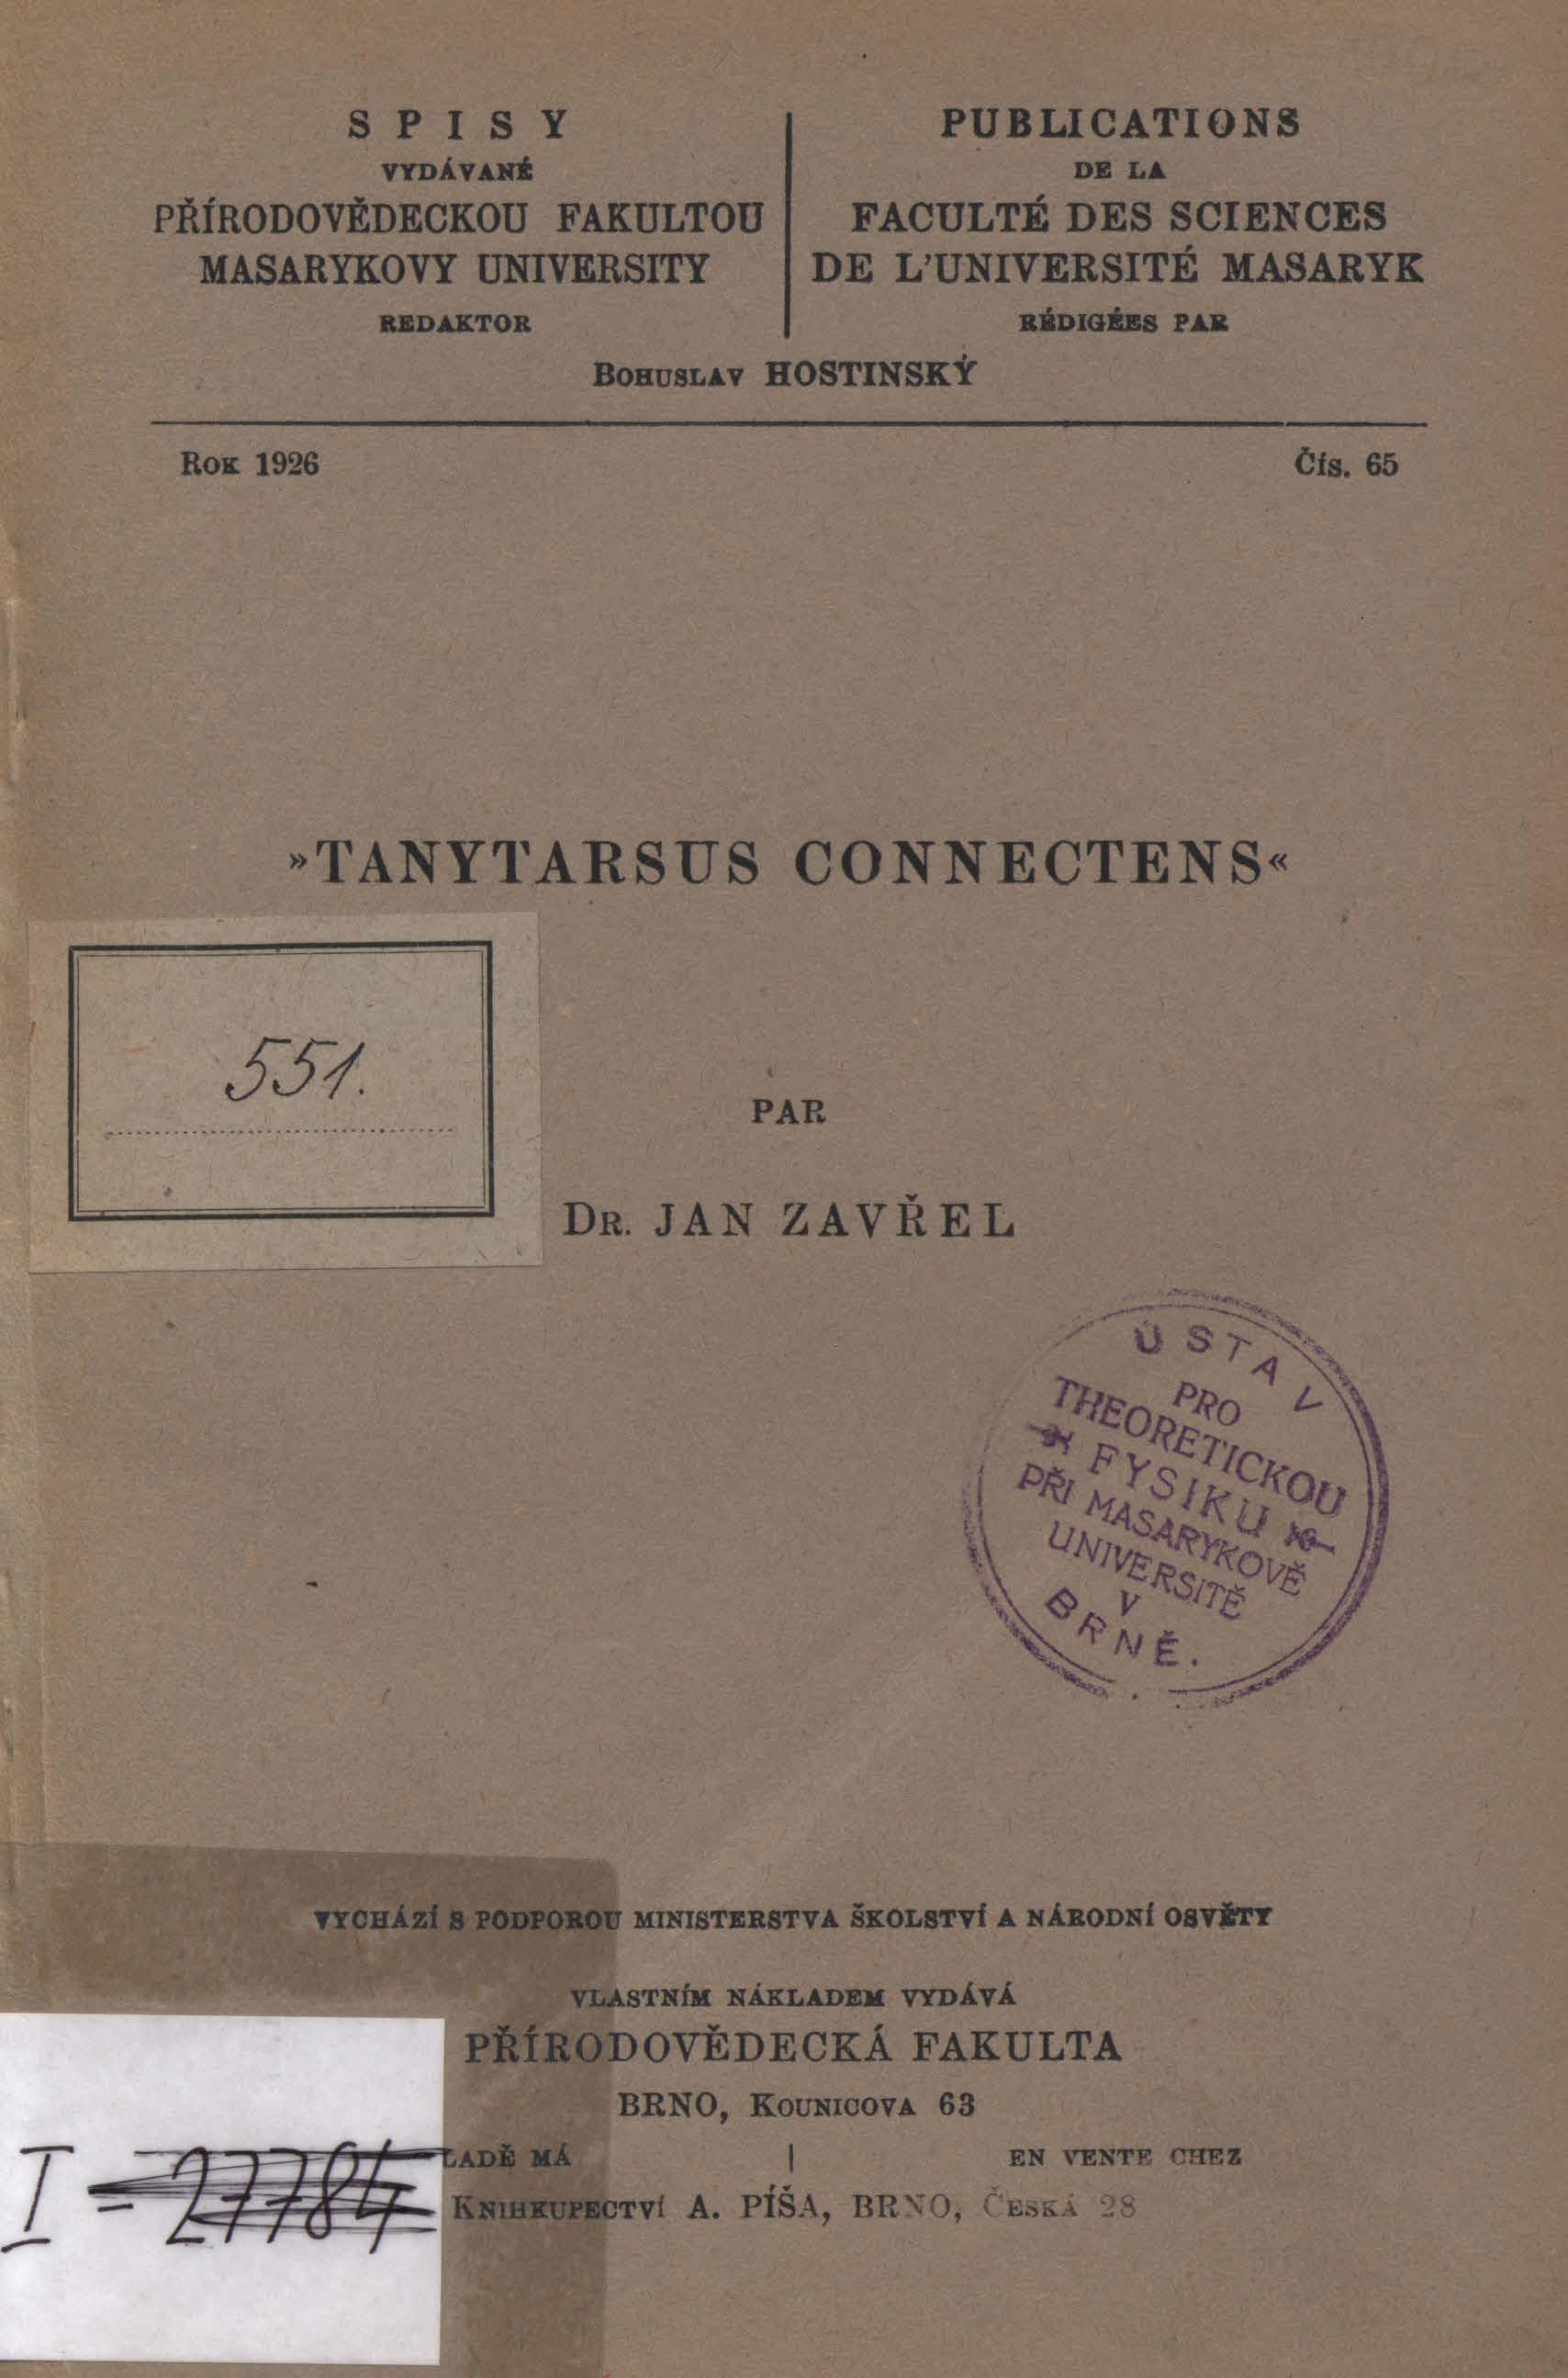 Obálka pro Tanytarsus connectens